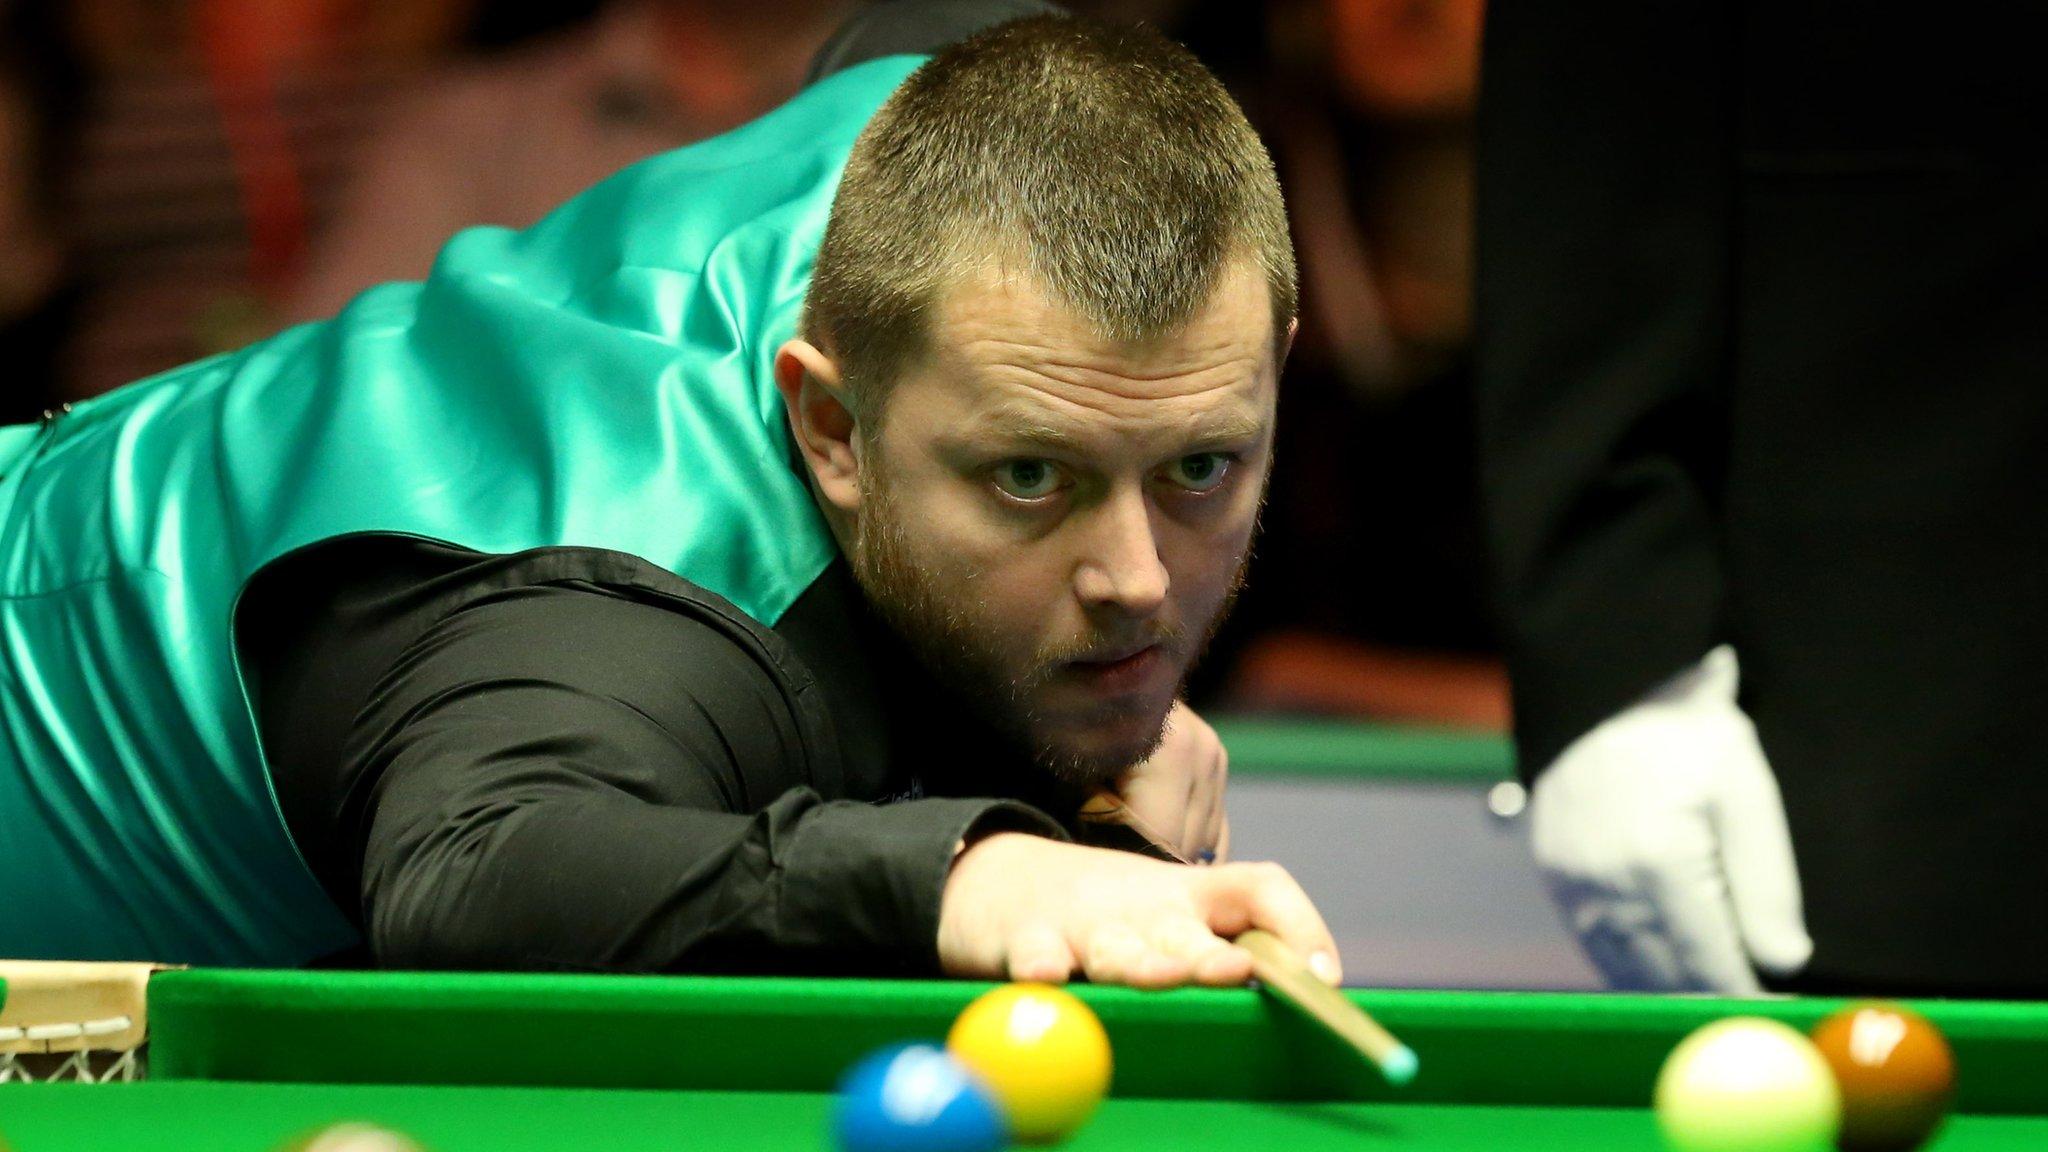 Northern Ireland Open: Mark Allen into round two but Shaun Murphy exits